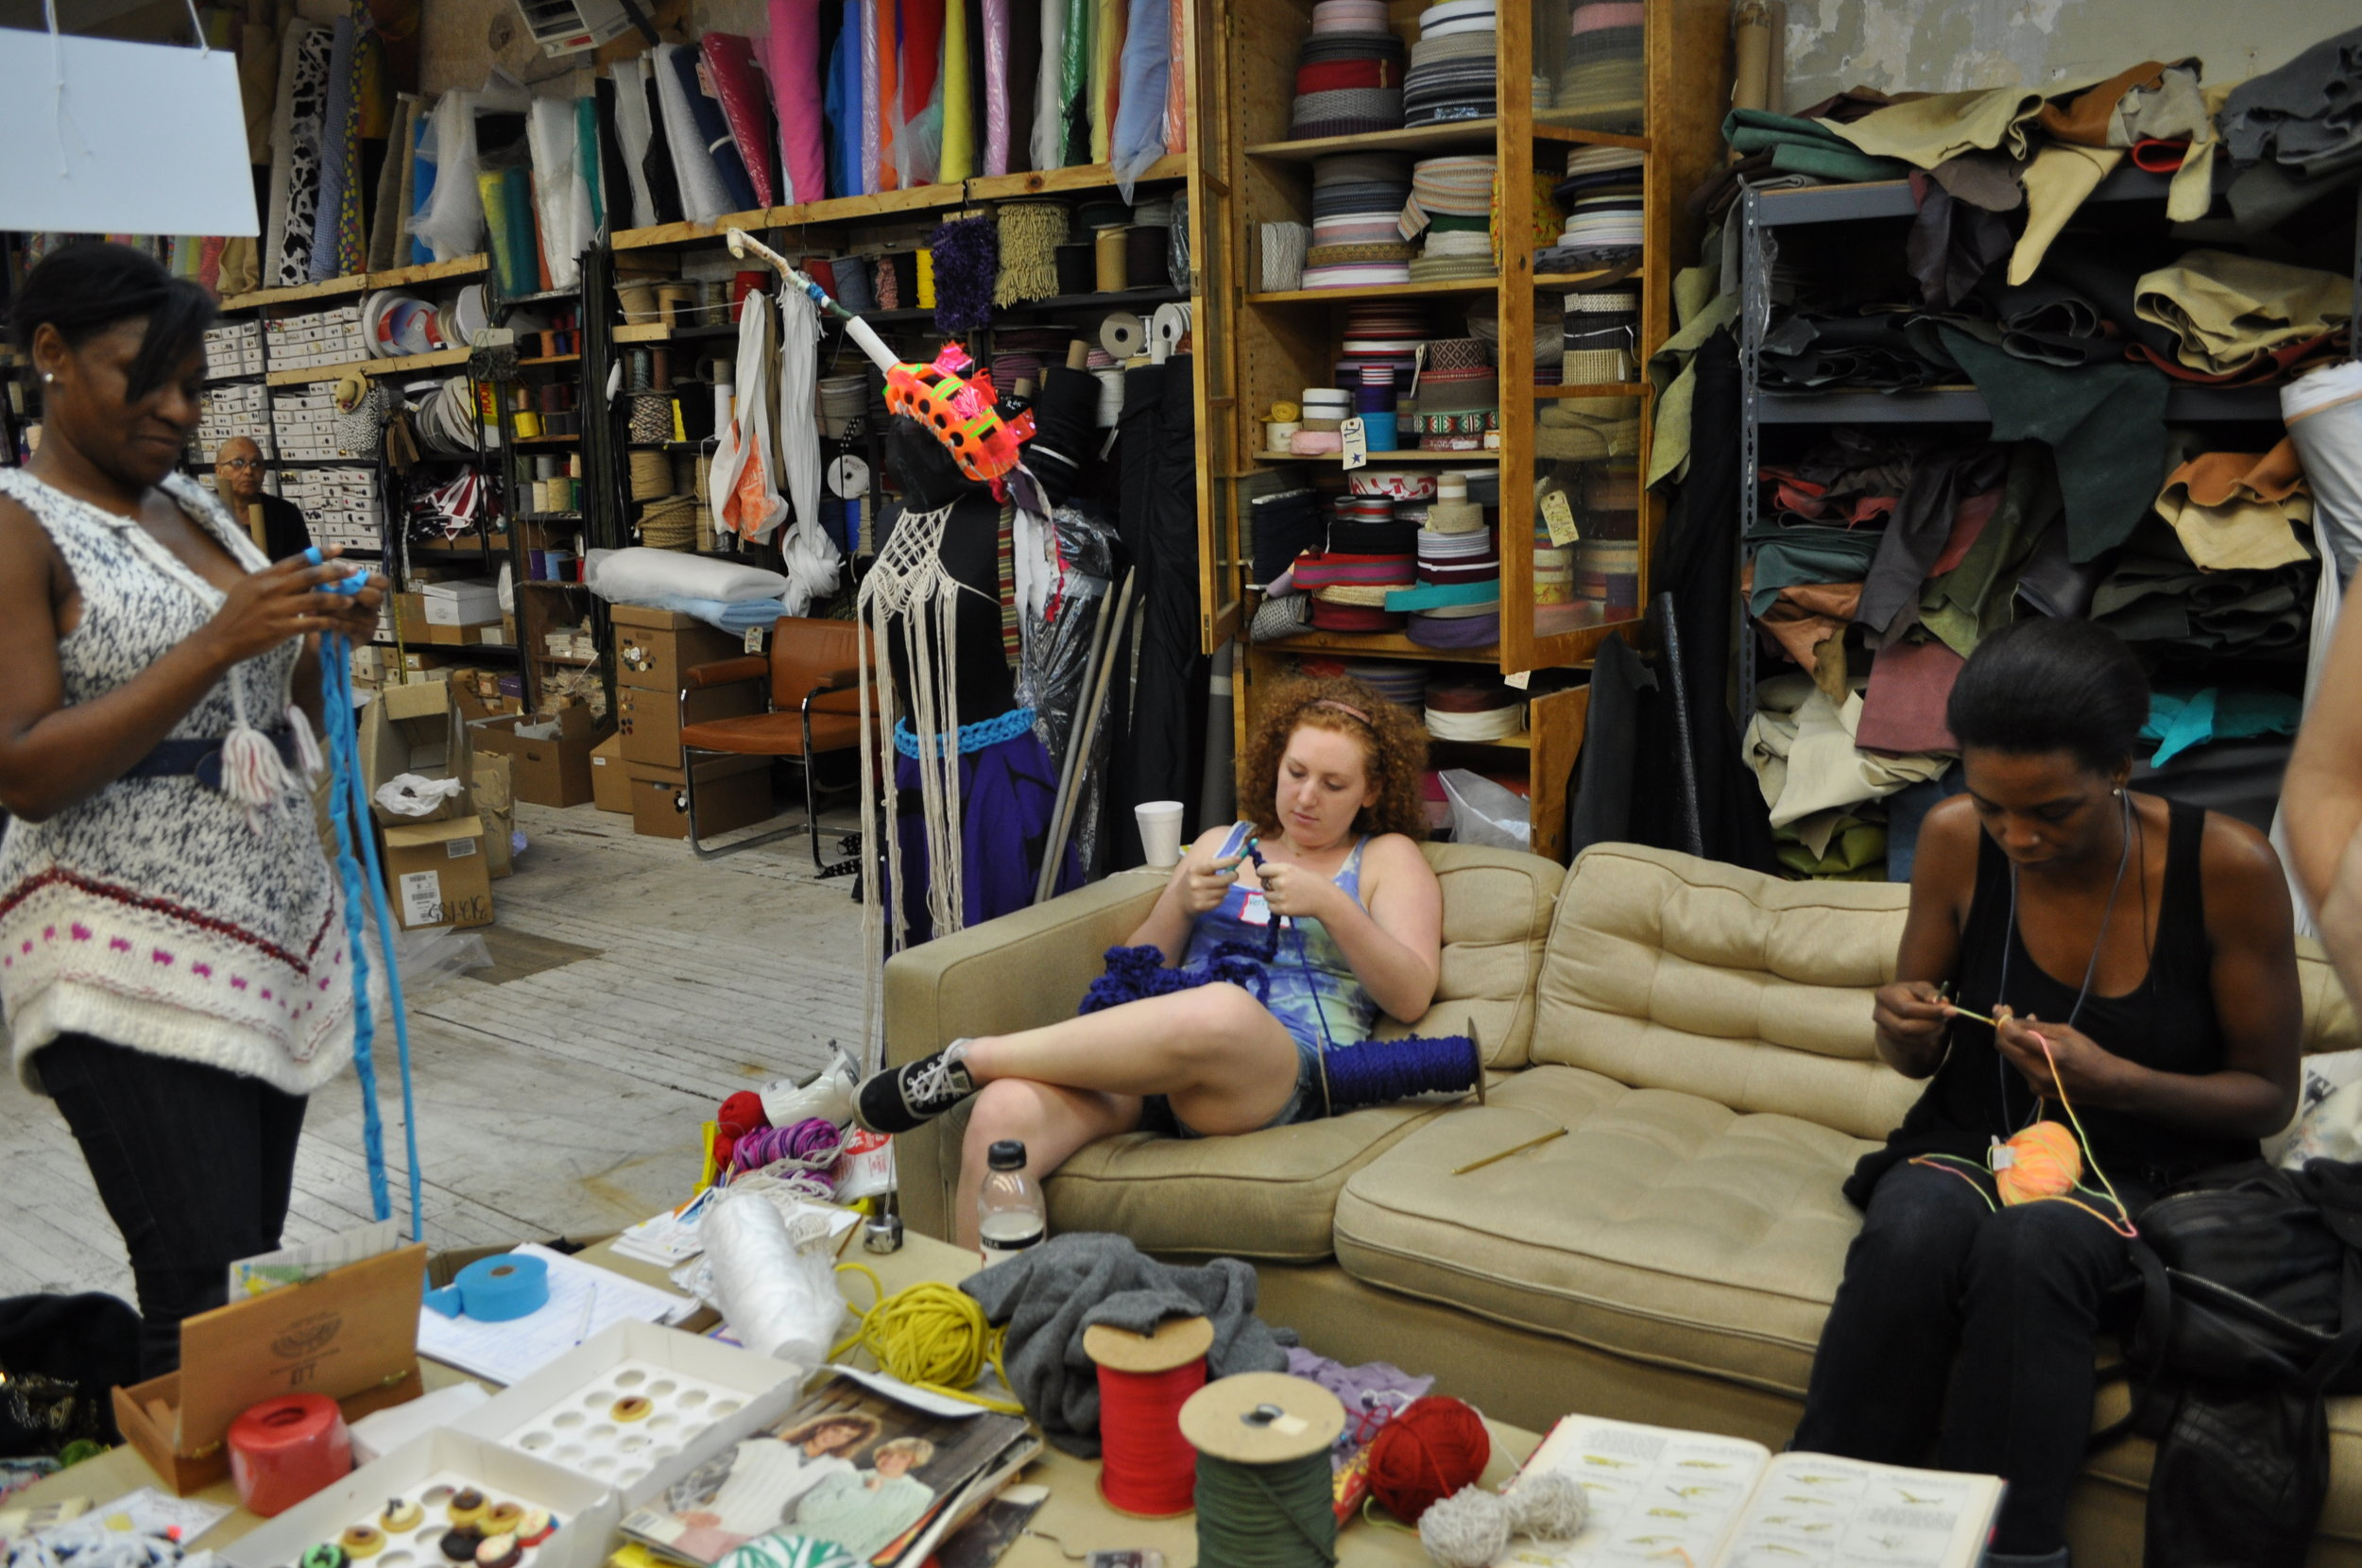 knitting-and-knotting-intently_5076071311_o.jpg